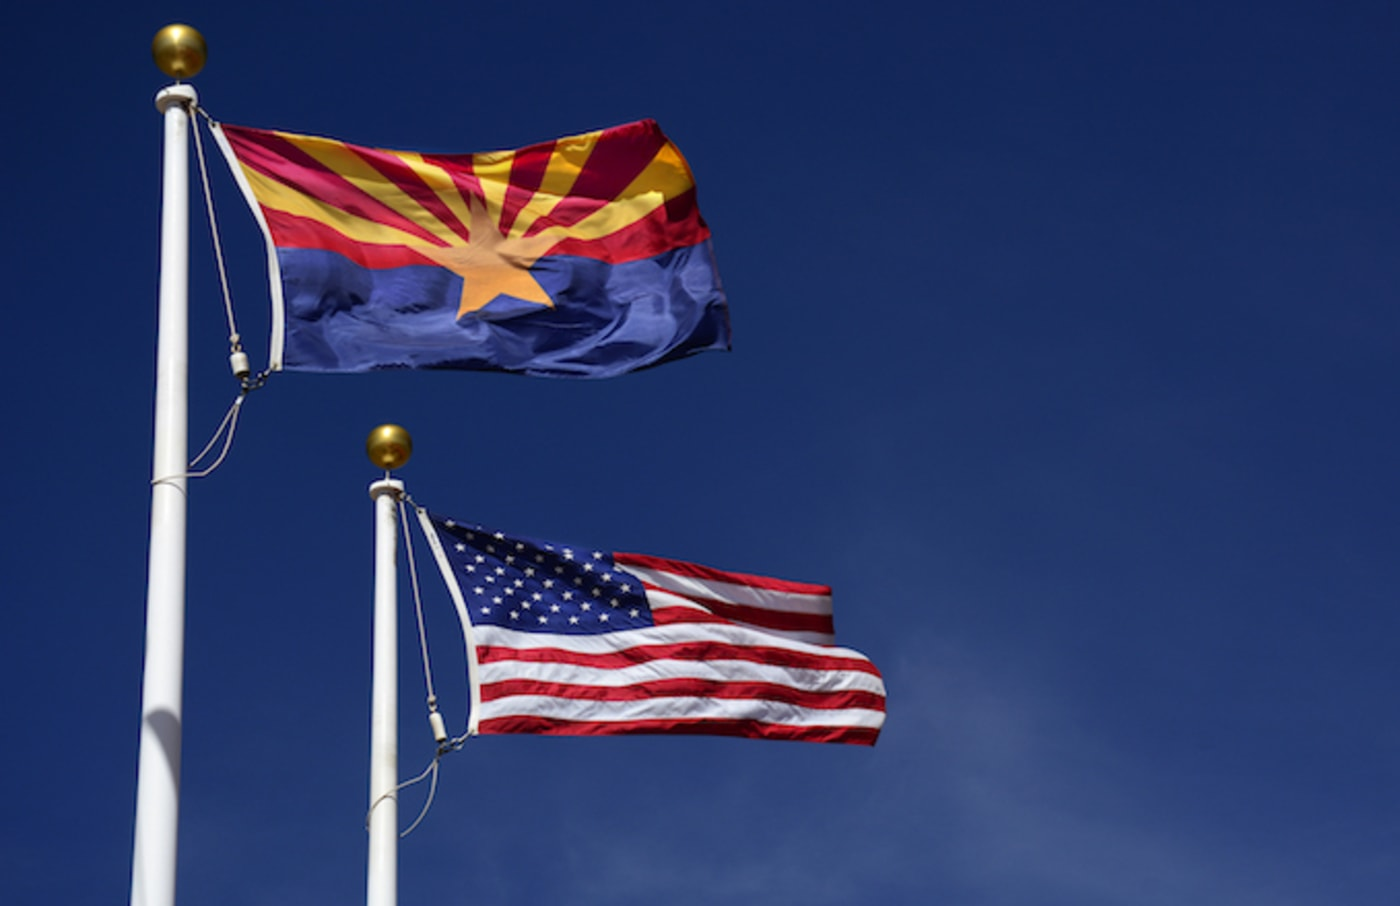 Arizona state flag flies beside the United States flag